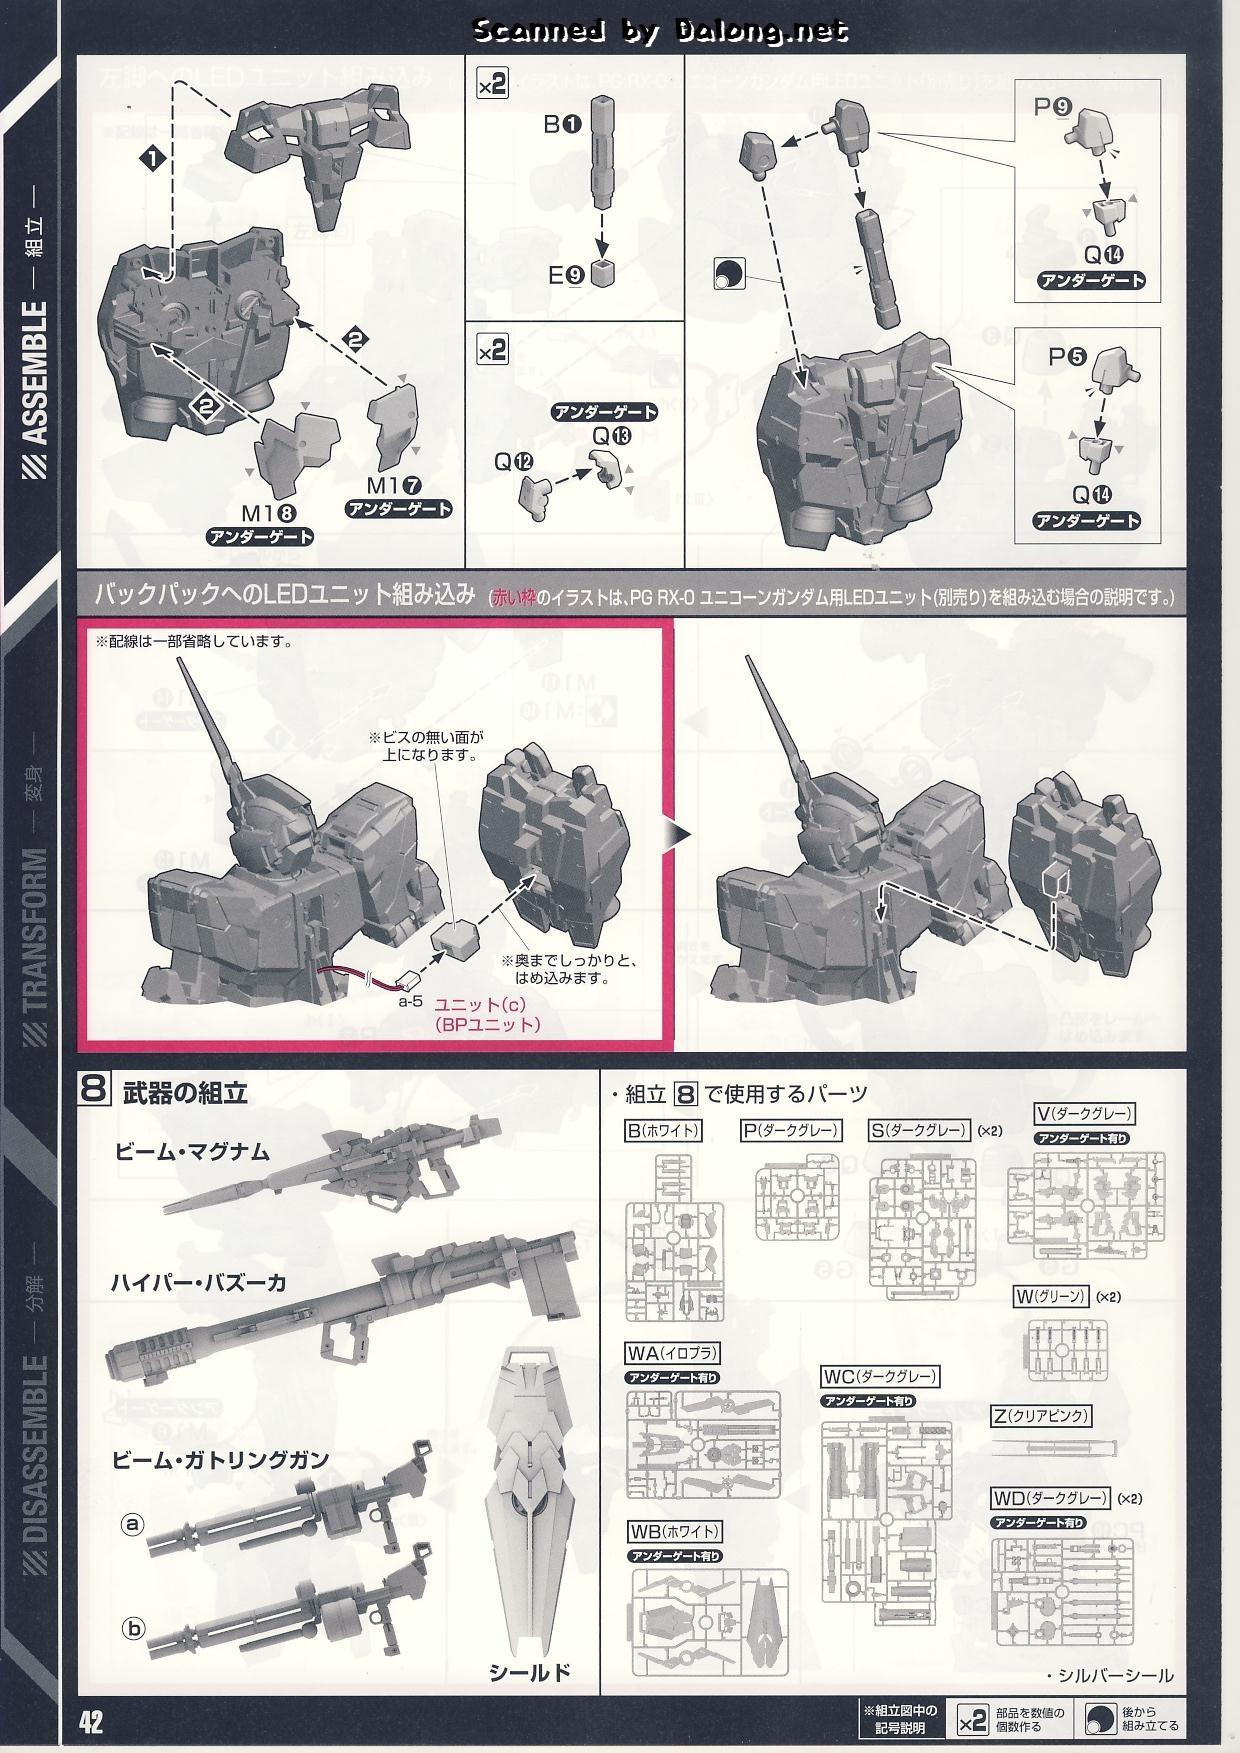 PG15独角兽高达说明42.JPG